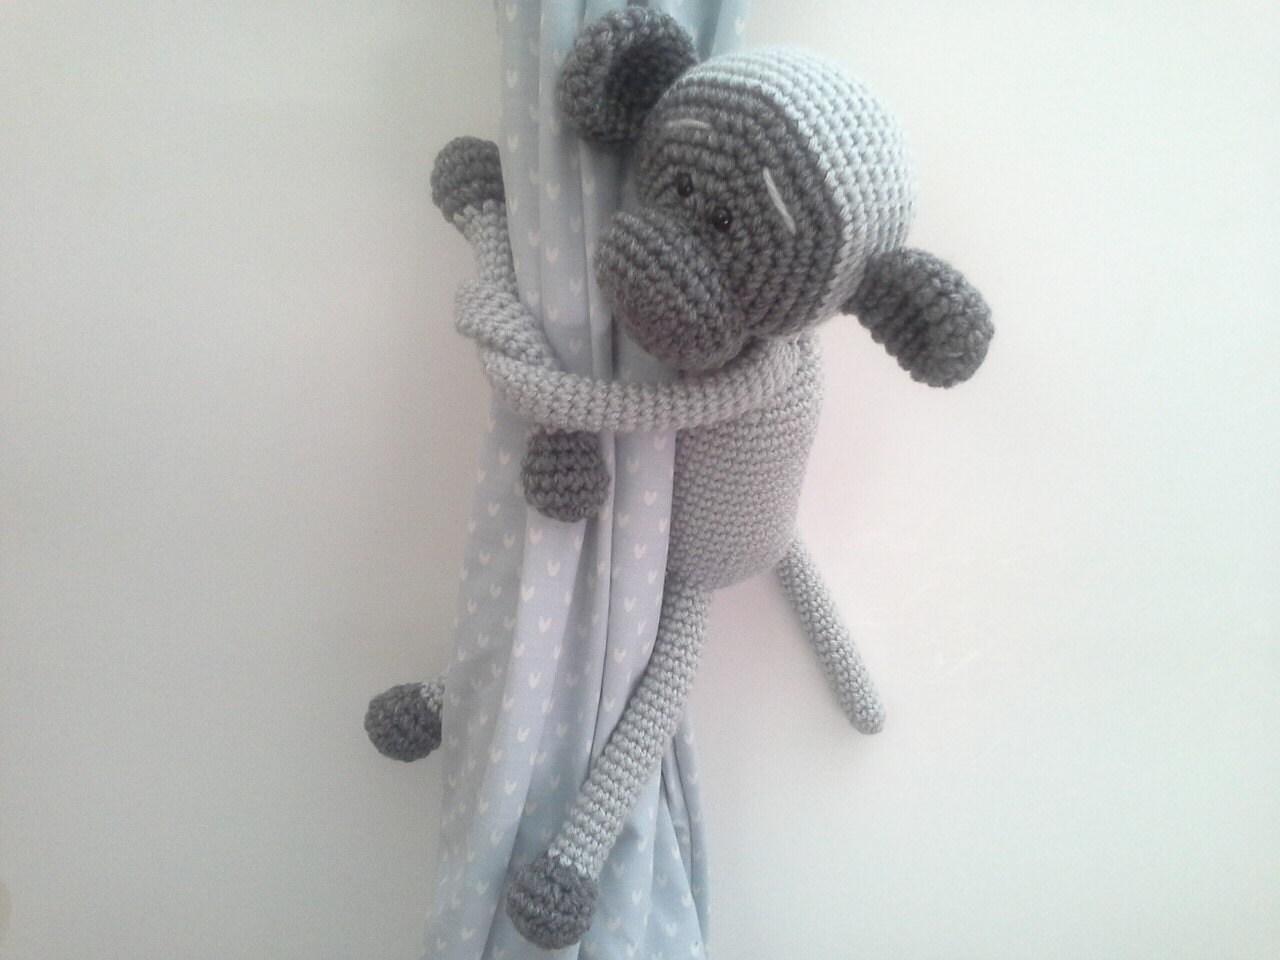 Monkey Curtains Tie Backs Crochet Monkey Amigurumi Custom